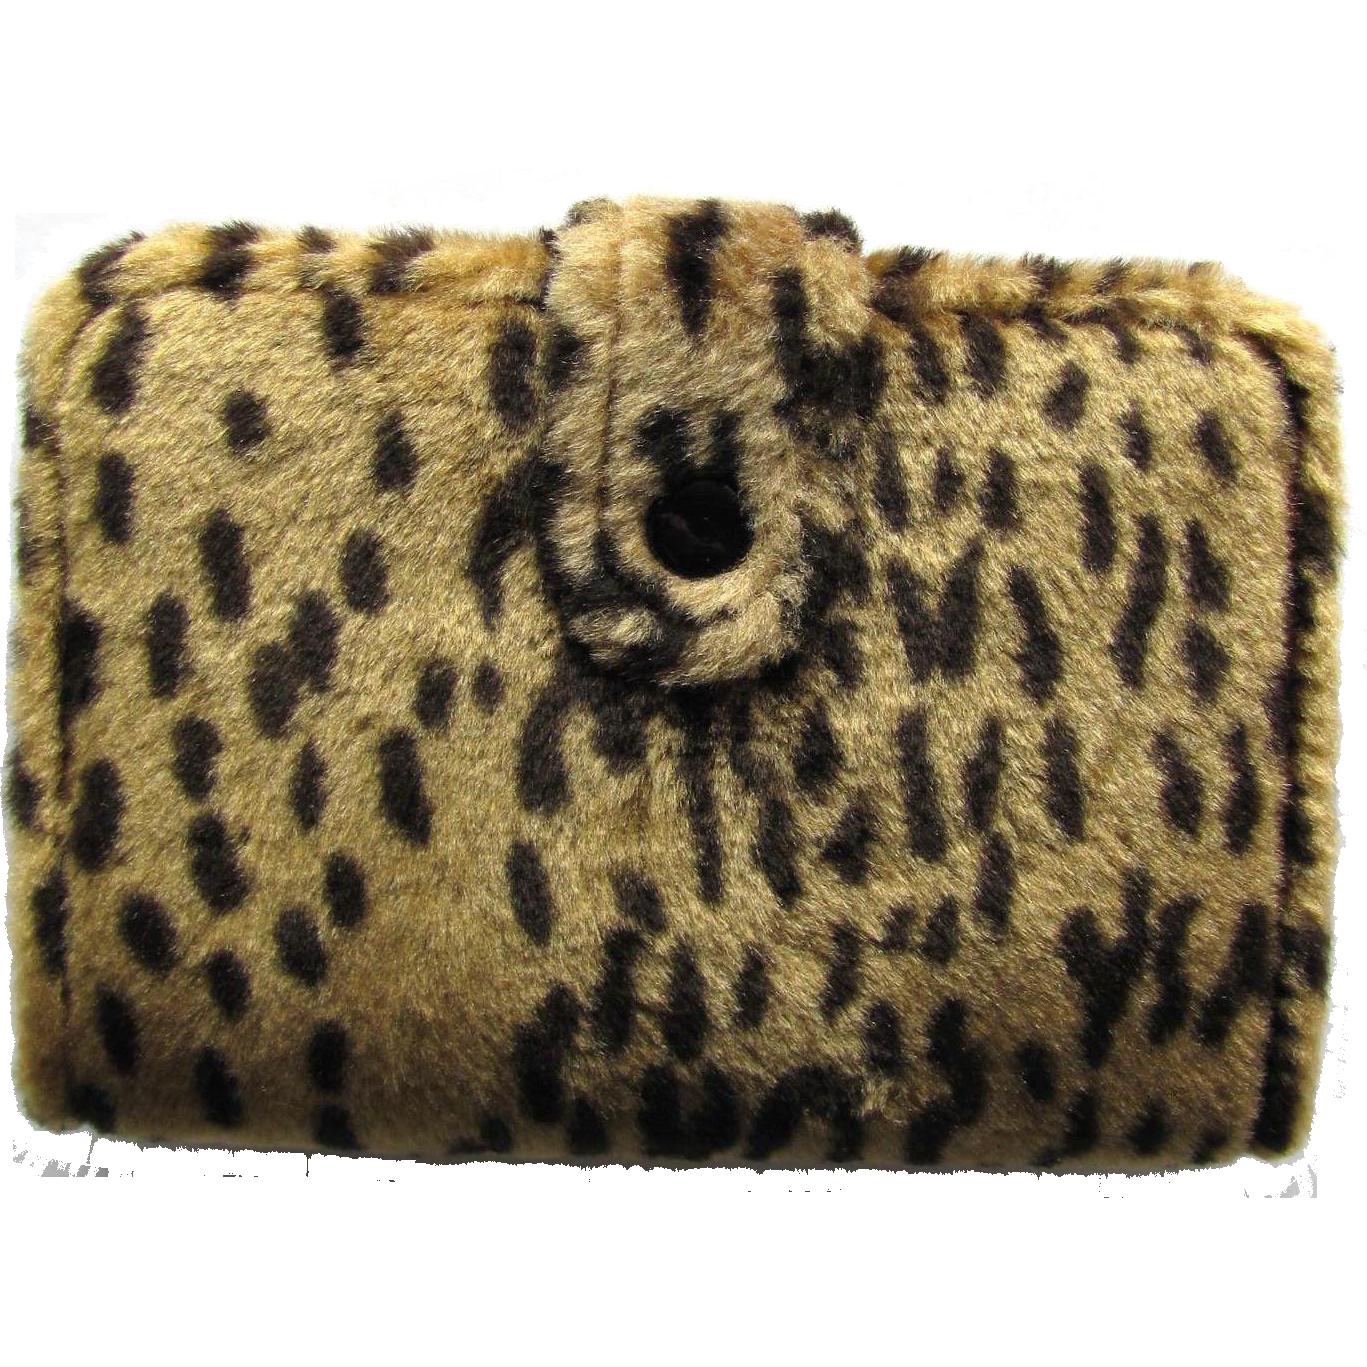 Vintage Animal Print Agenda Wallet with Faux Cheetah Fur - Day Planner - 1996 Calendar